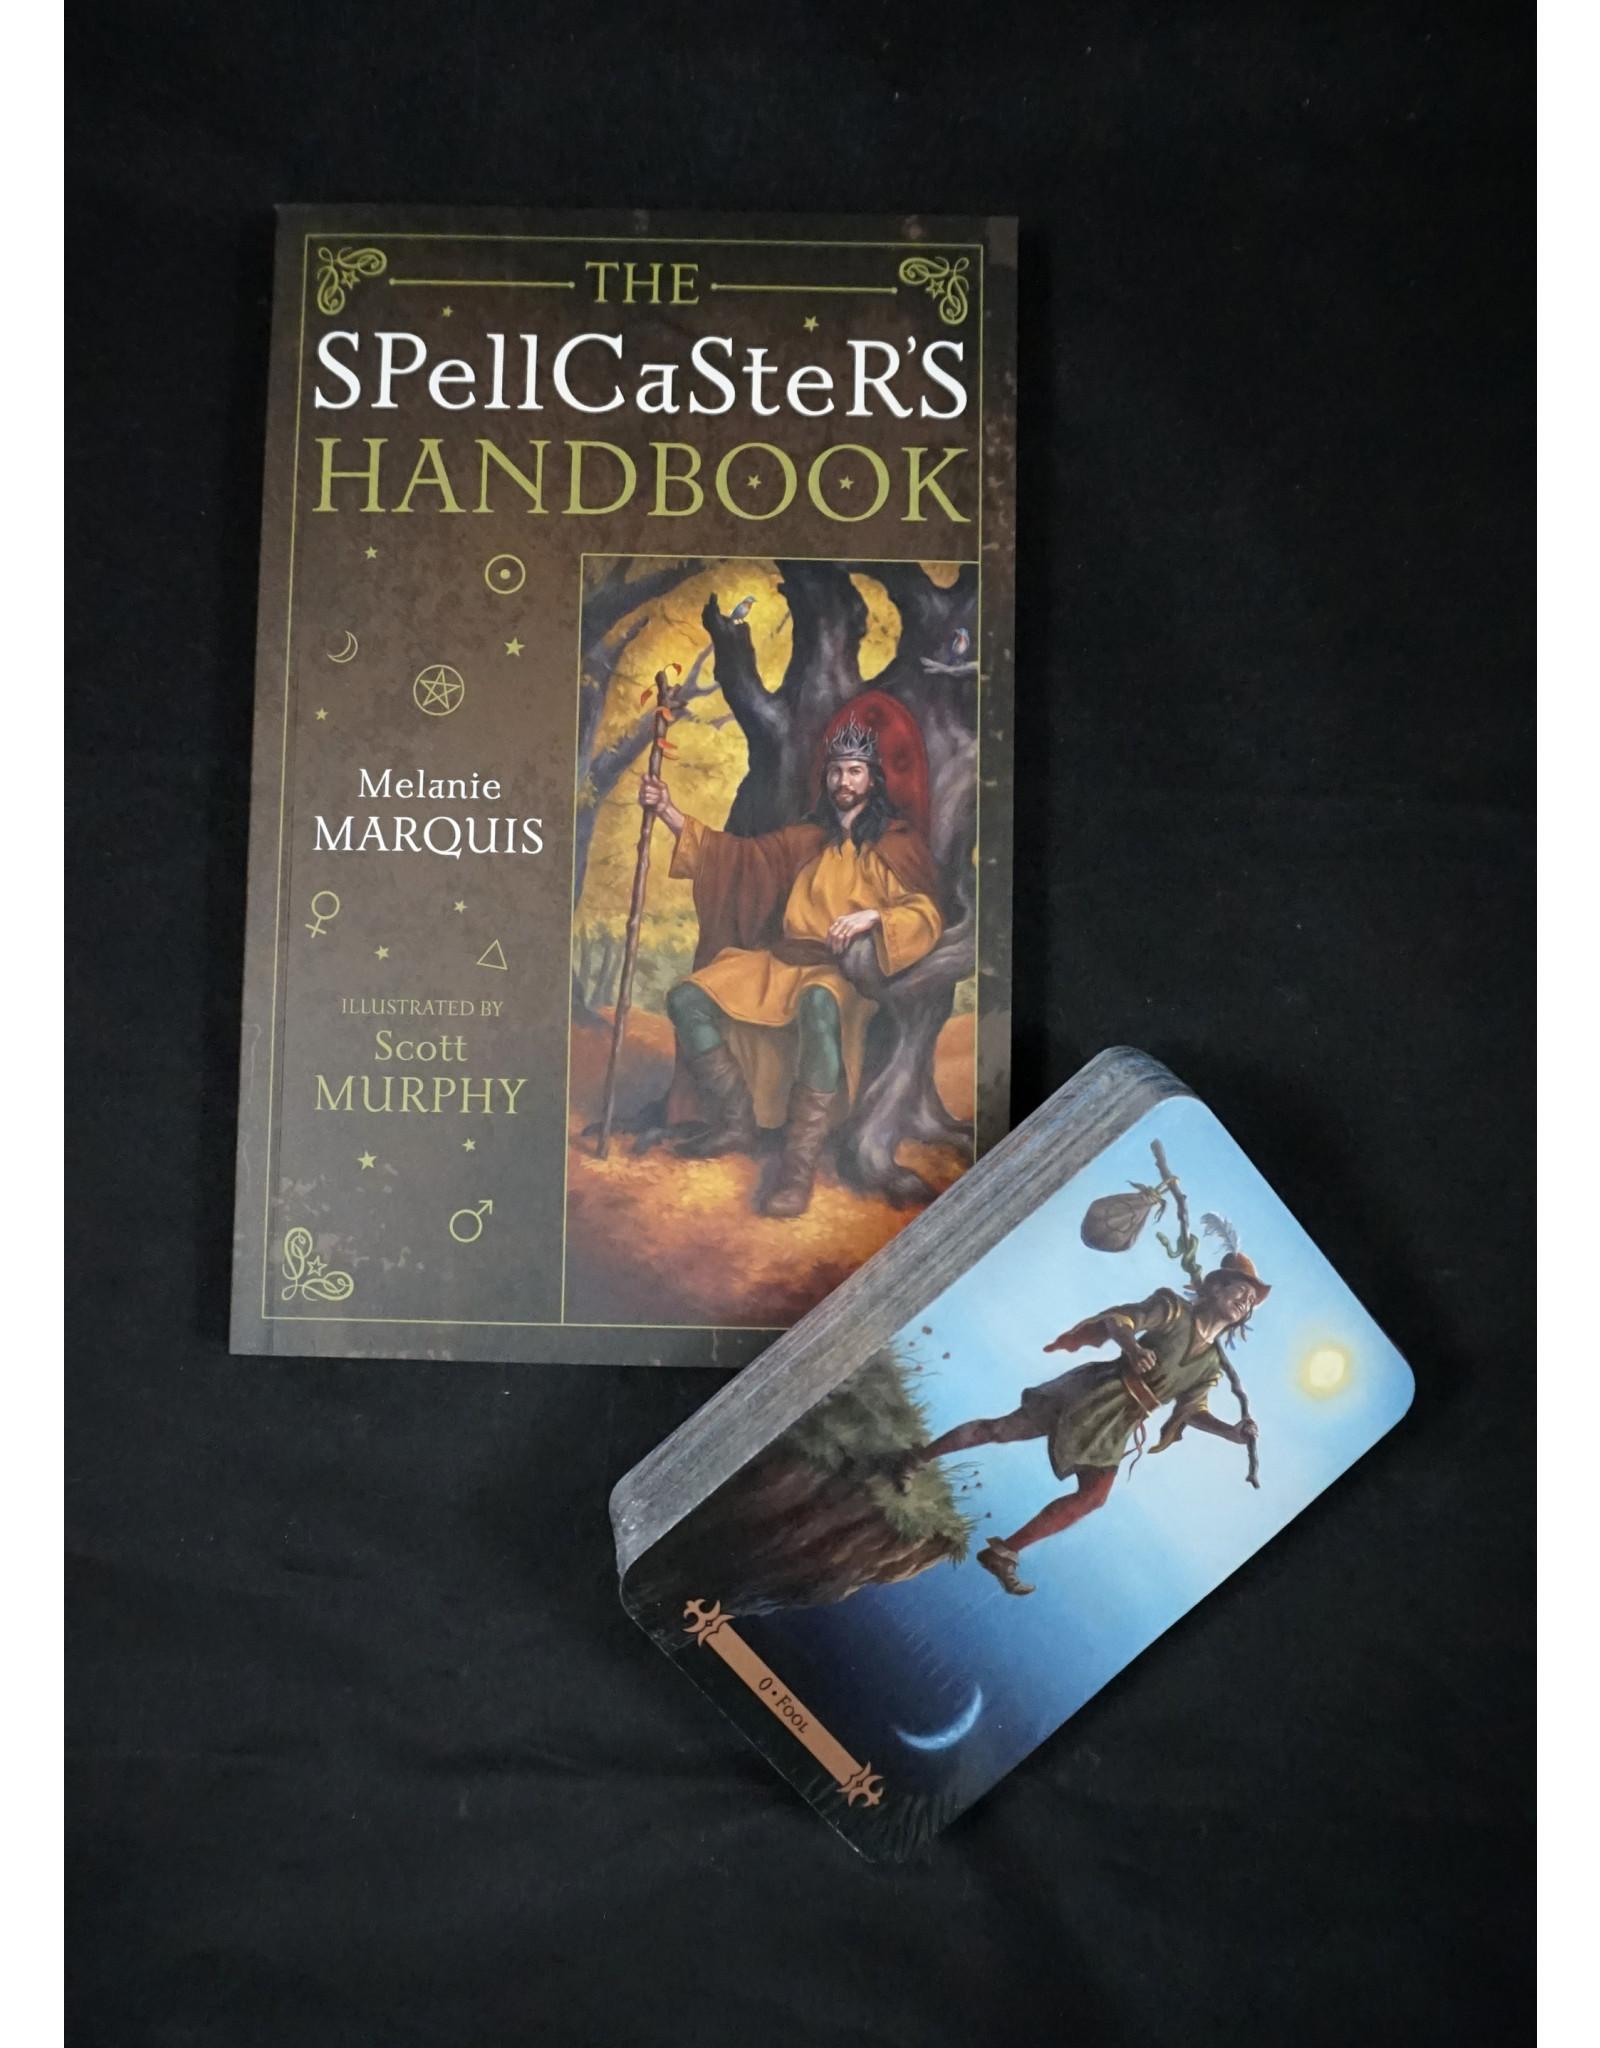 Modern Spellcaster's Tarot by Melanie Marquis